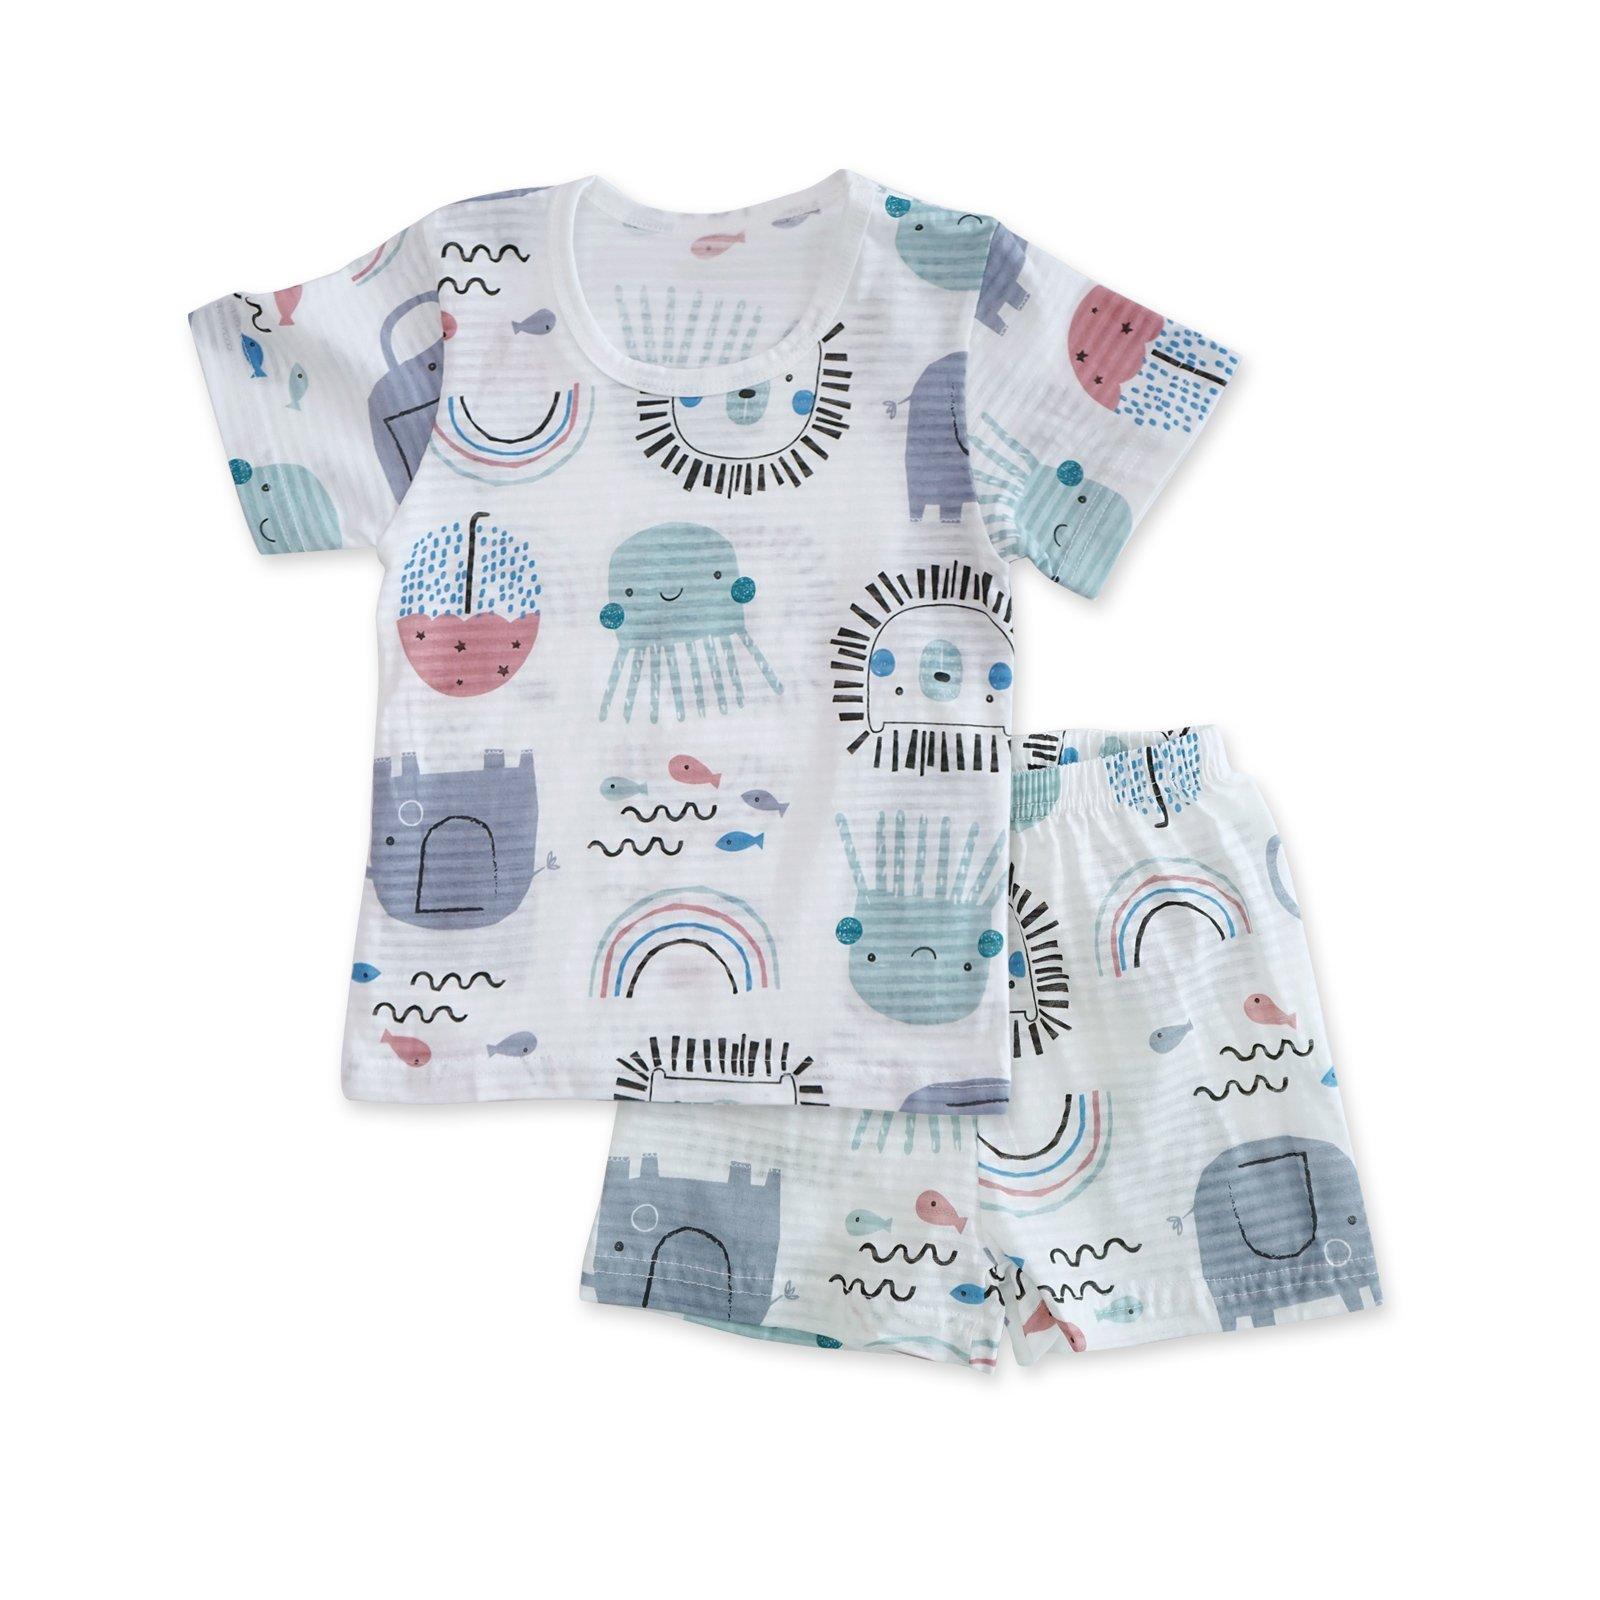 MiNiK Toddler Kids Boys Girls Cotton Pajama Short Sleeve Set - Summer Juju (3T-4T)